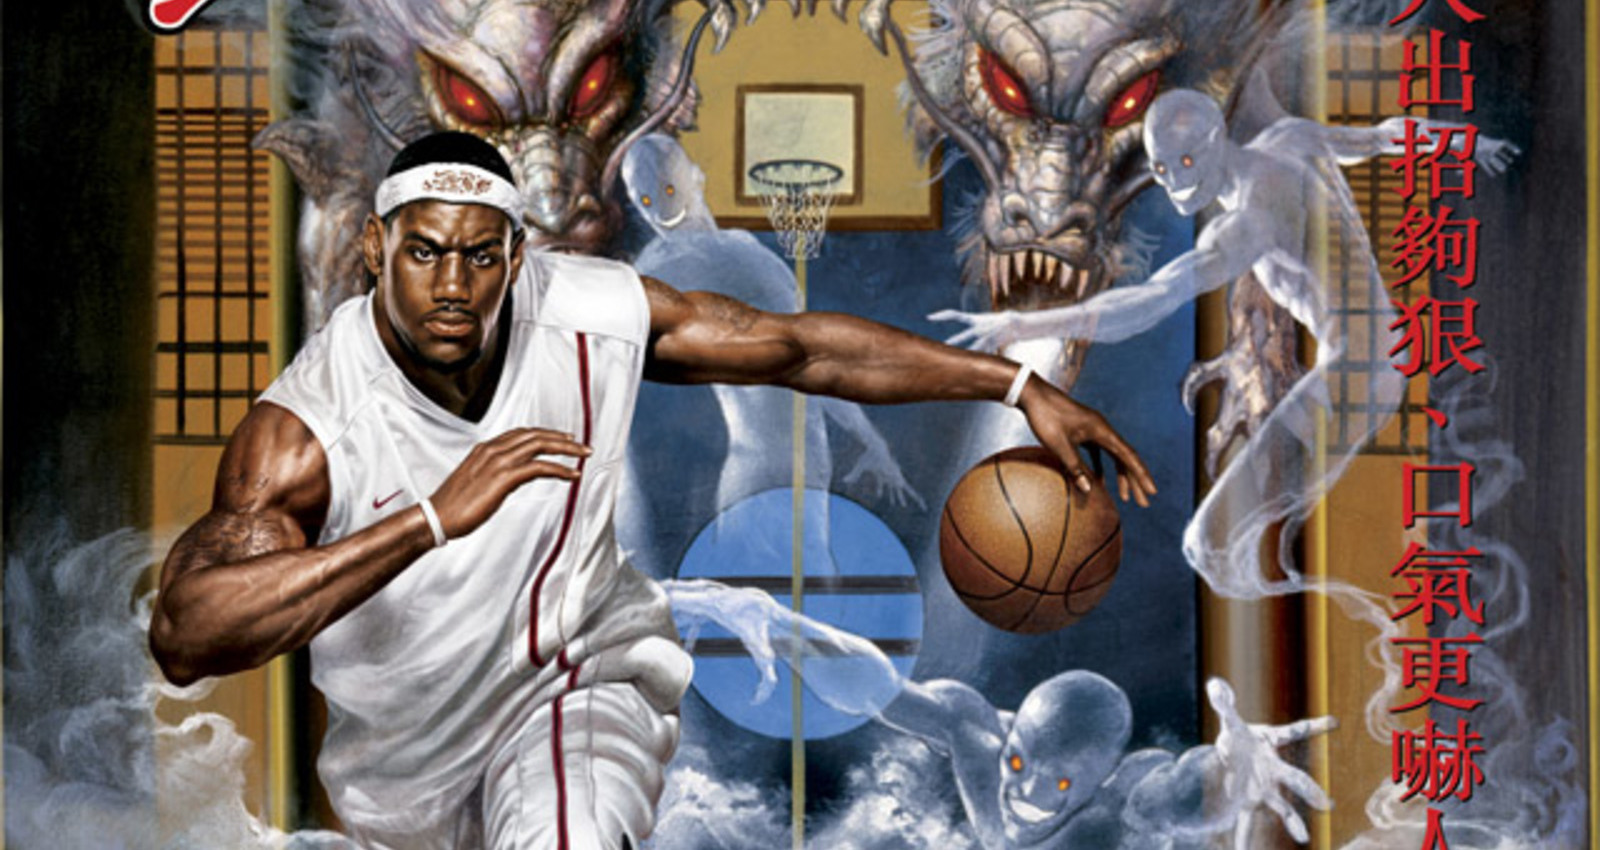 Nike Basketball: Chamber of Fear